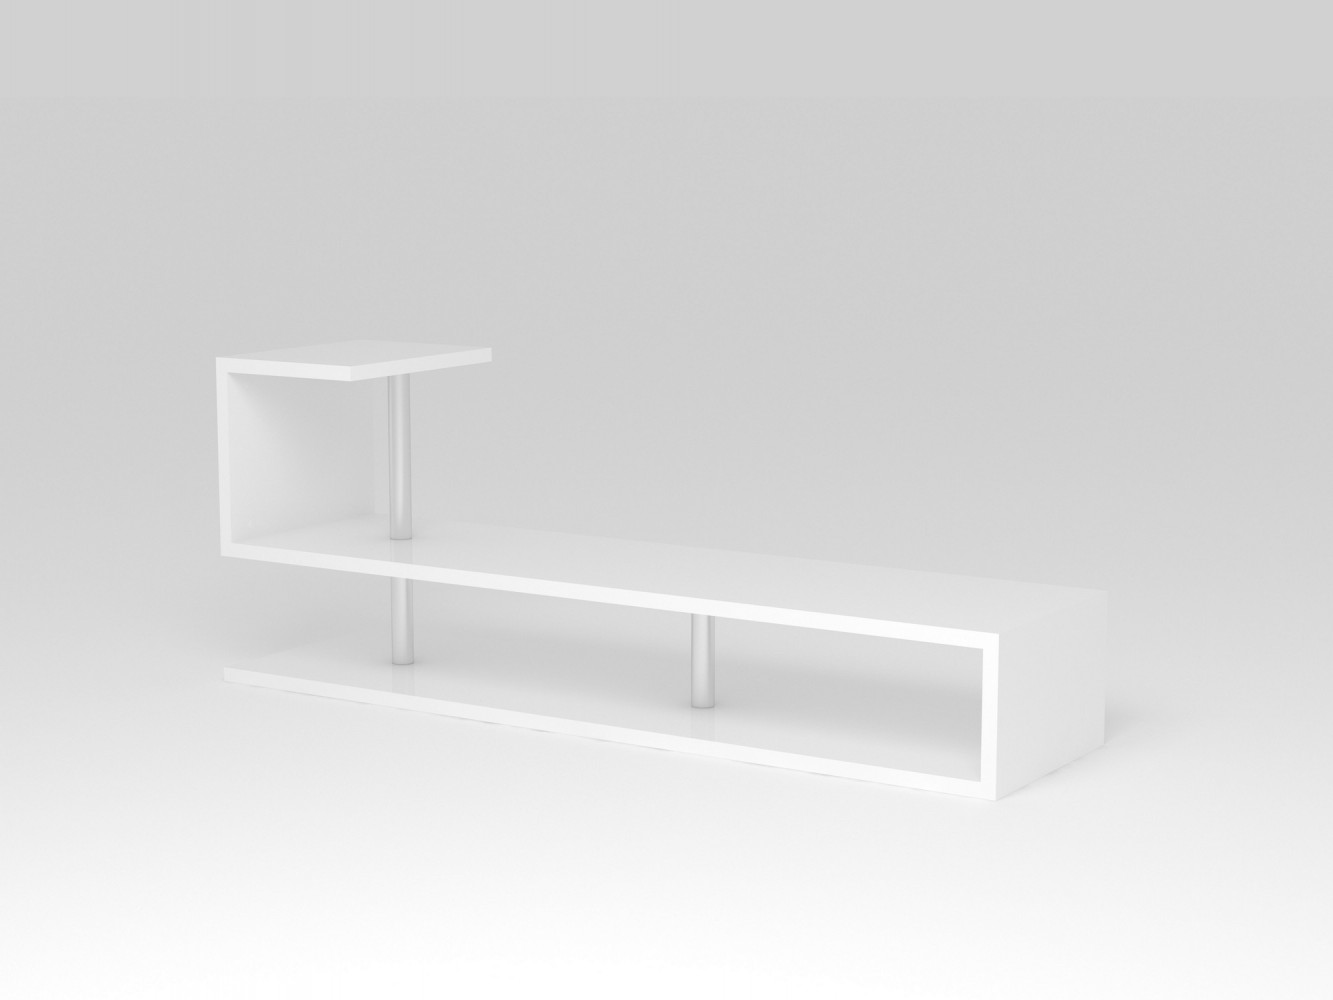 tecnos modern a tv lowboard breite 150cm wei. Black Bedroom Furniture Sets. Home Design Ideas